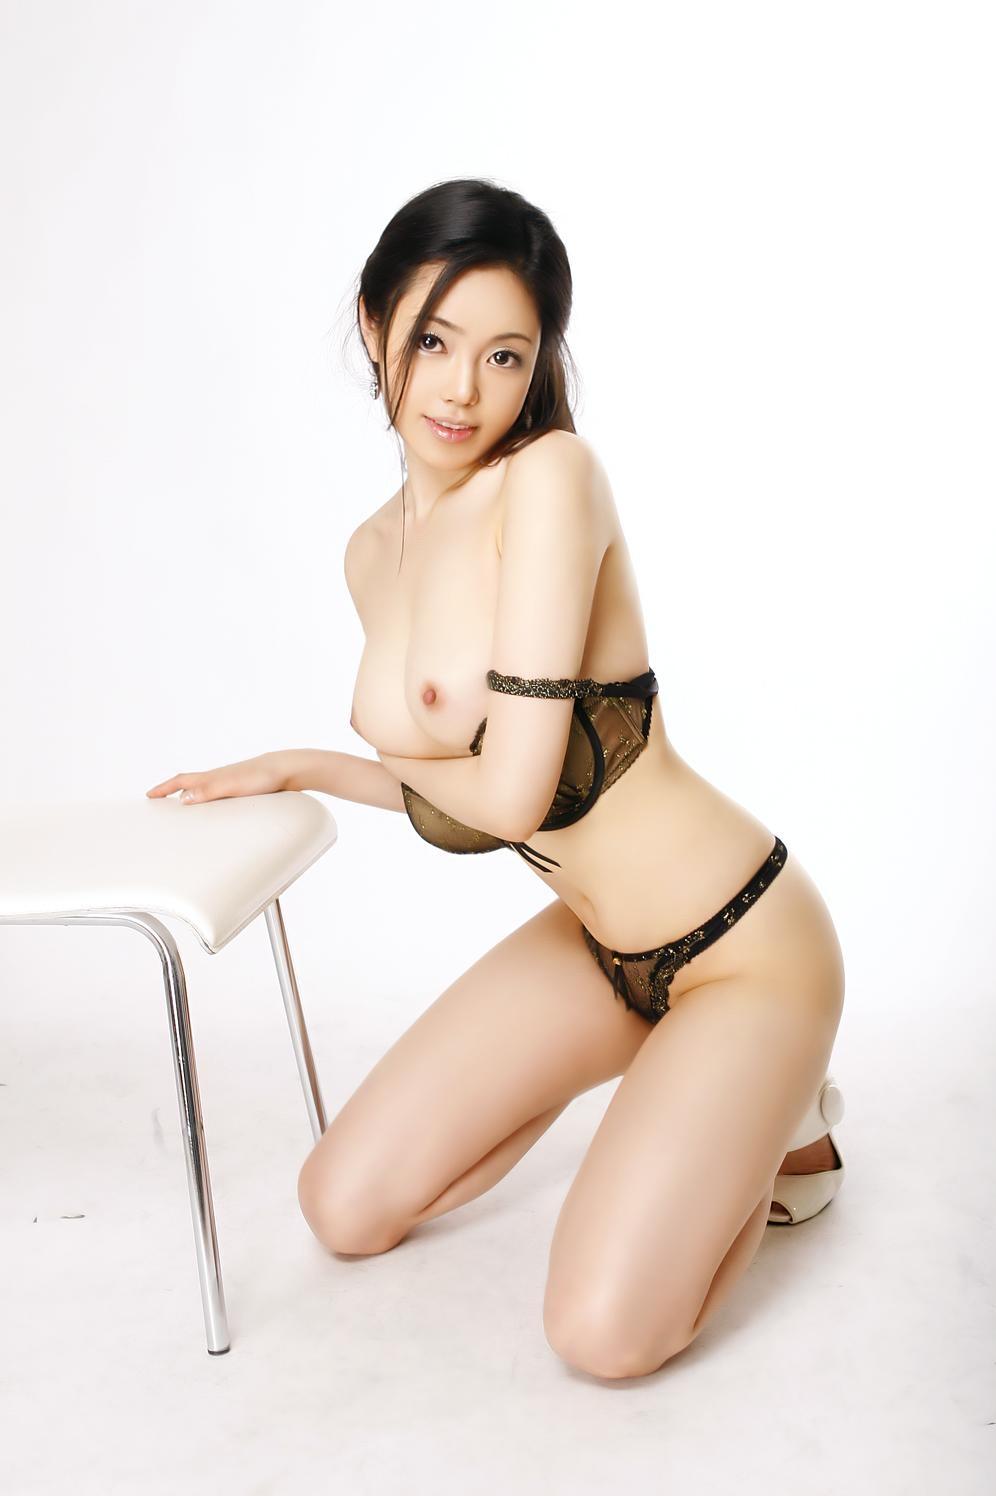 PhimVu.blogspot.com Korean Girls Epic Photoshop part 12